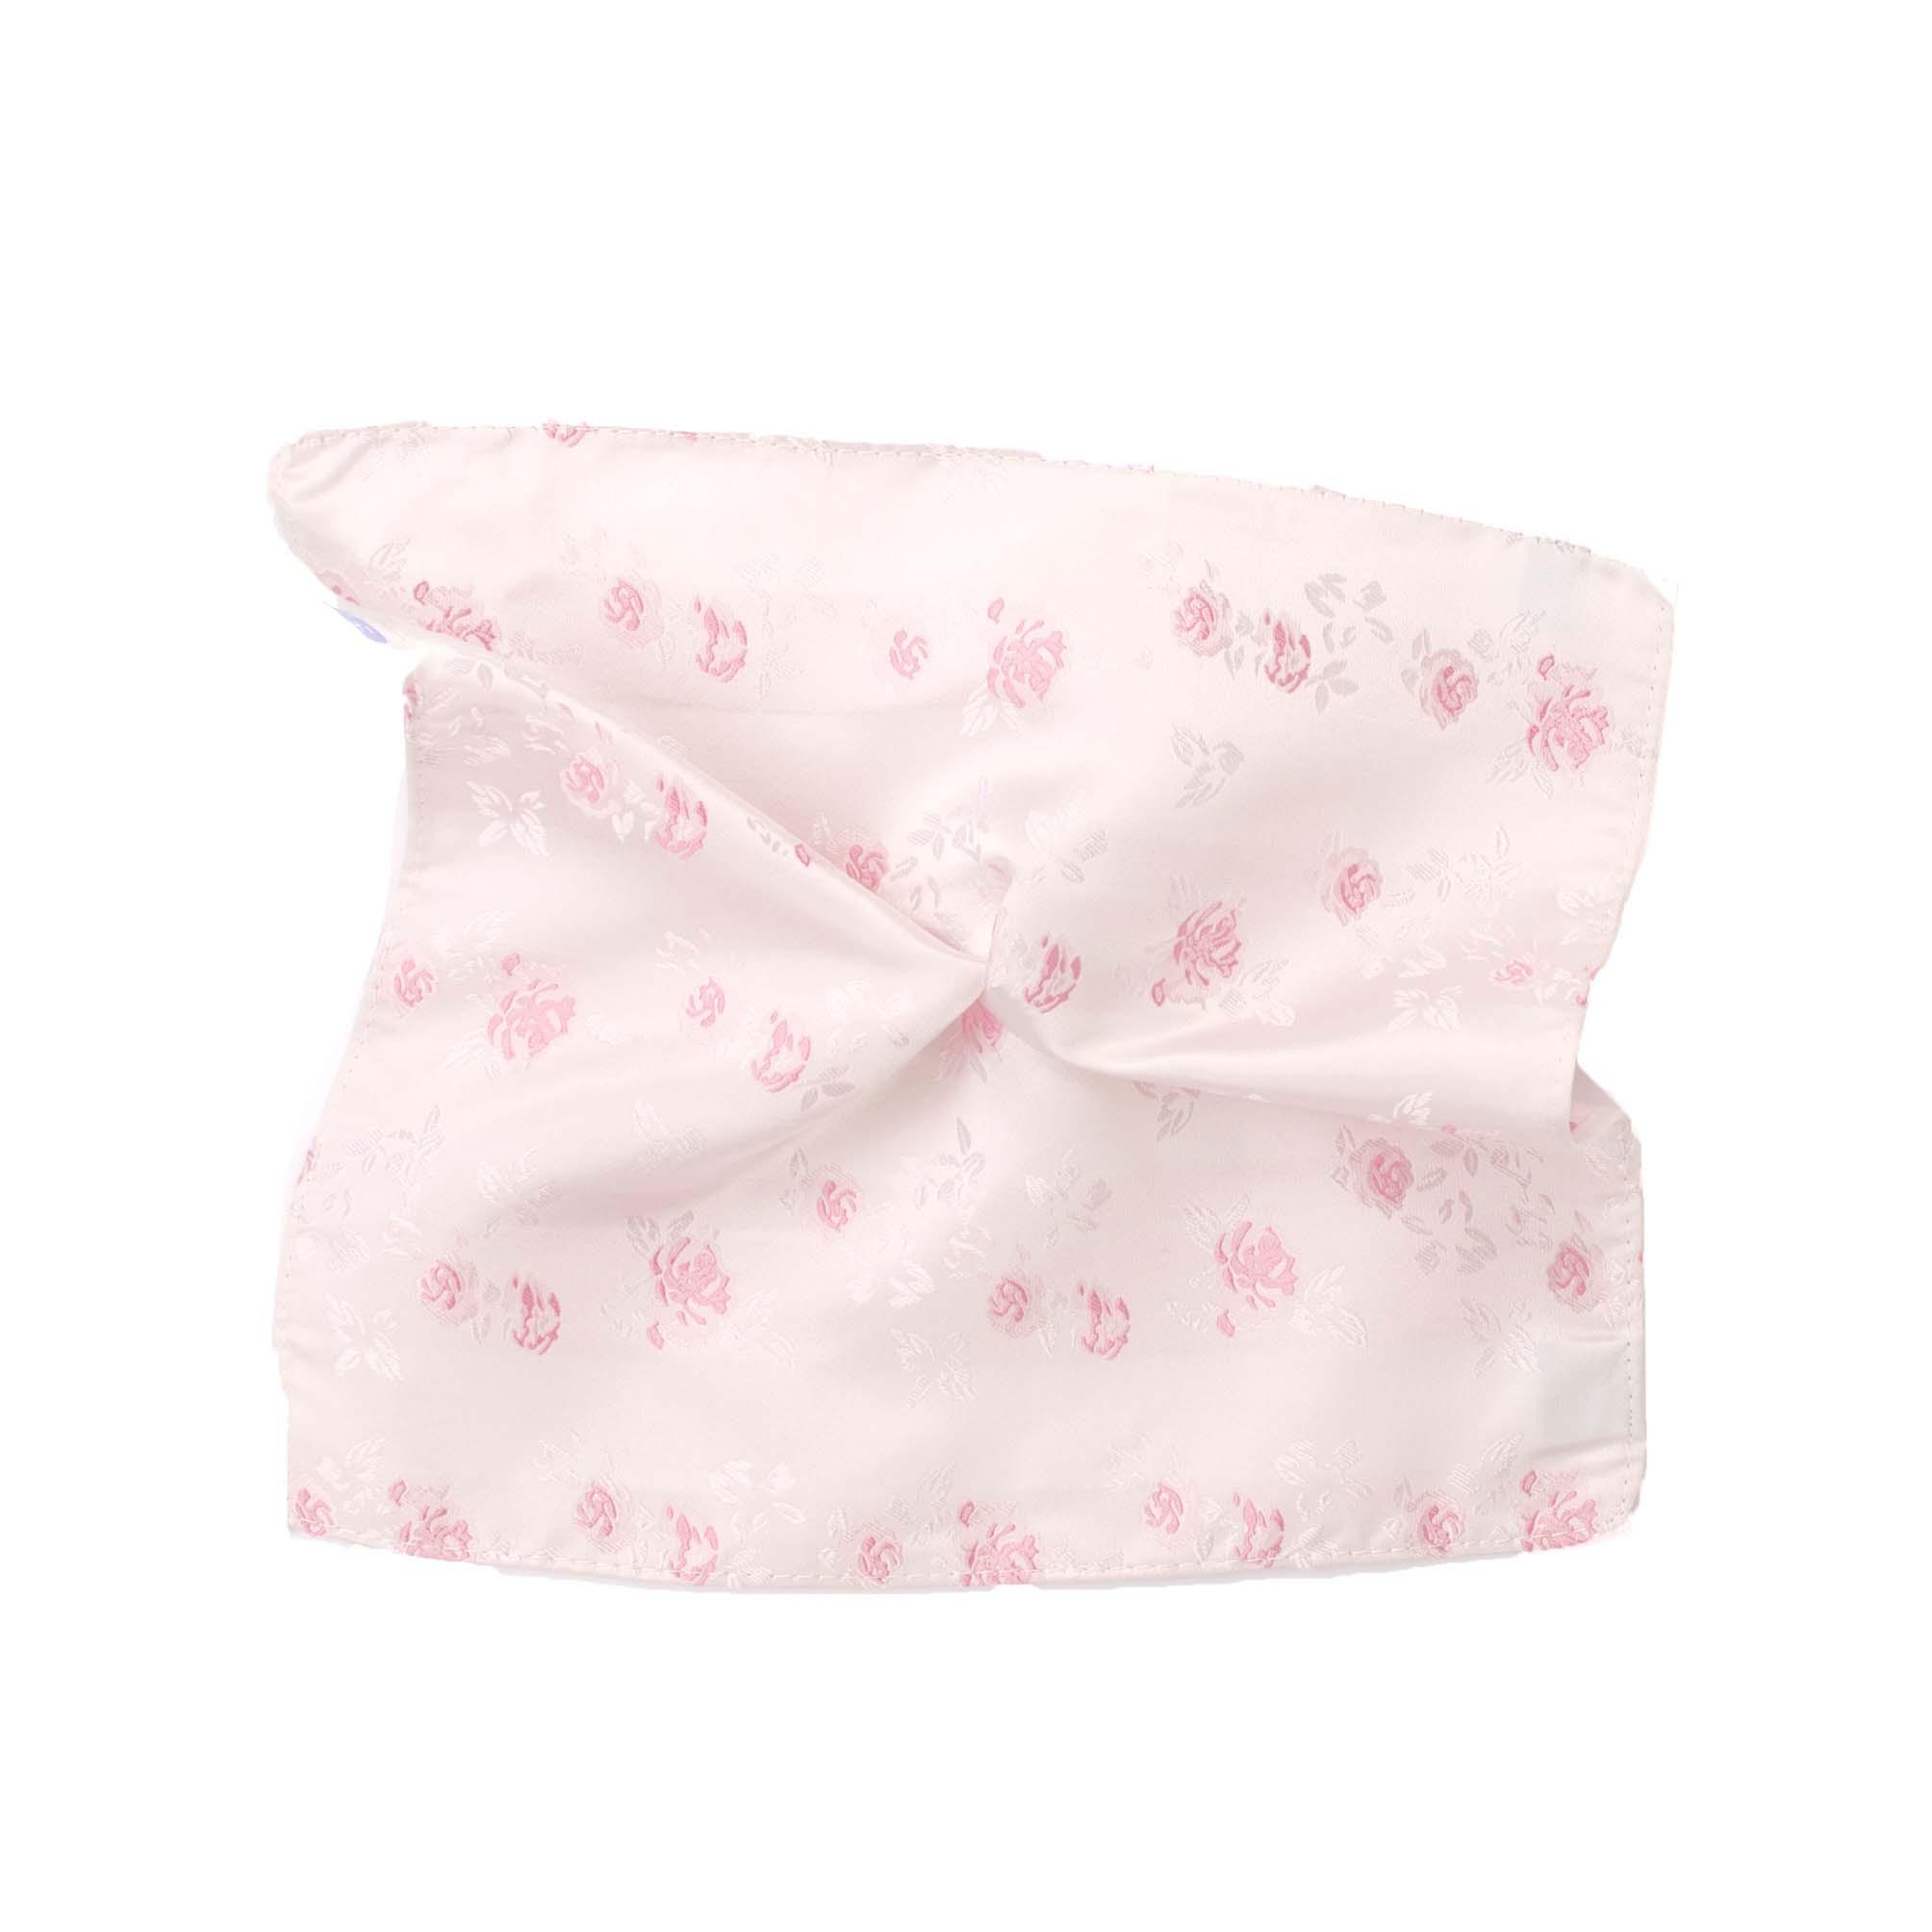 Pocket square silk pink flowers